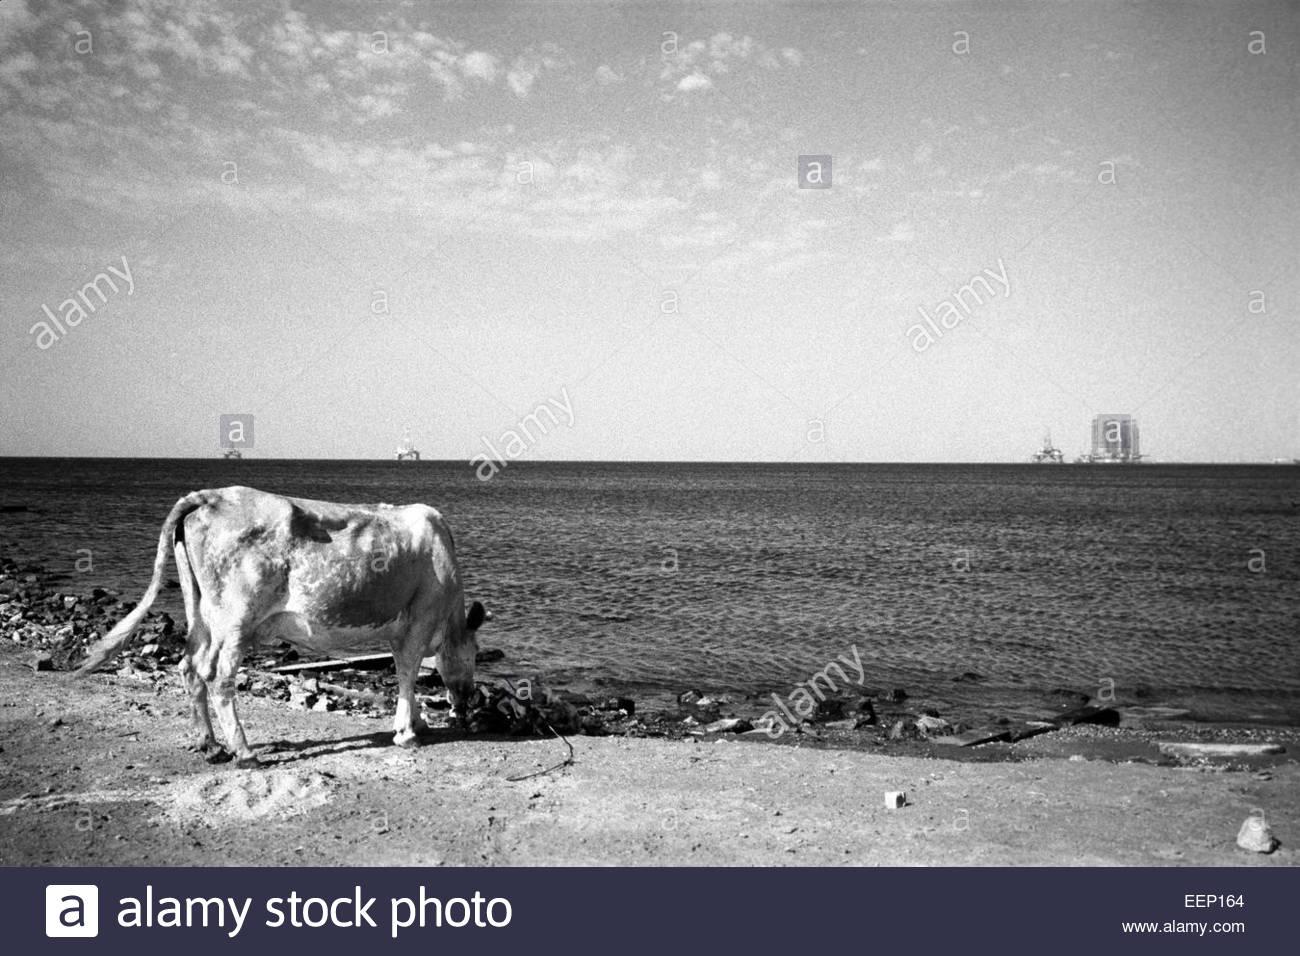 A cow and  oil platforms on Caspien sea, Baku, Azerbaijan. - Stock Image